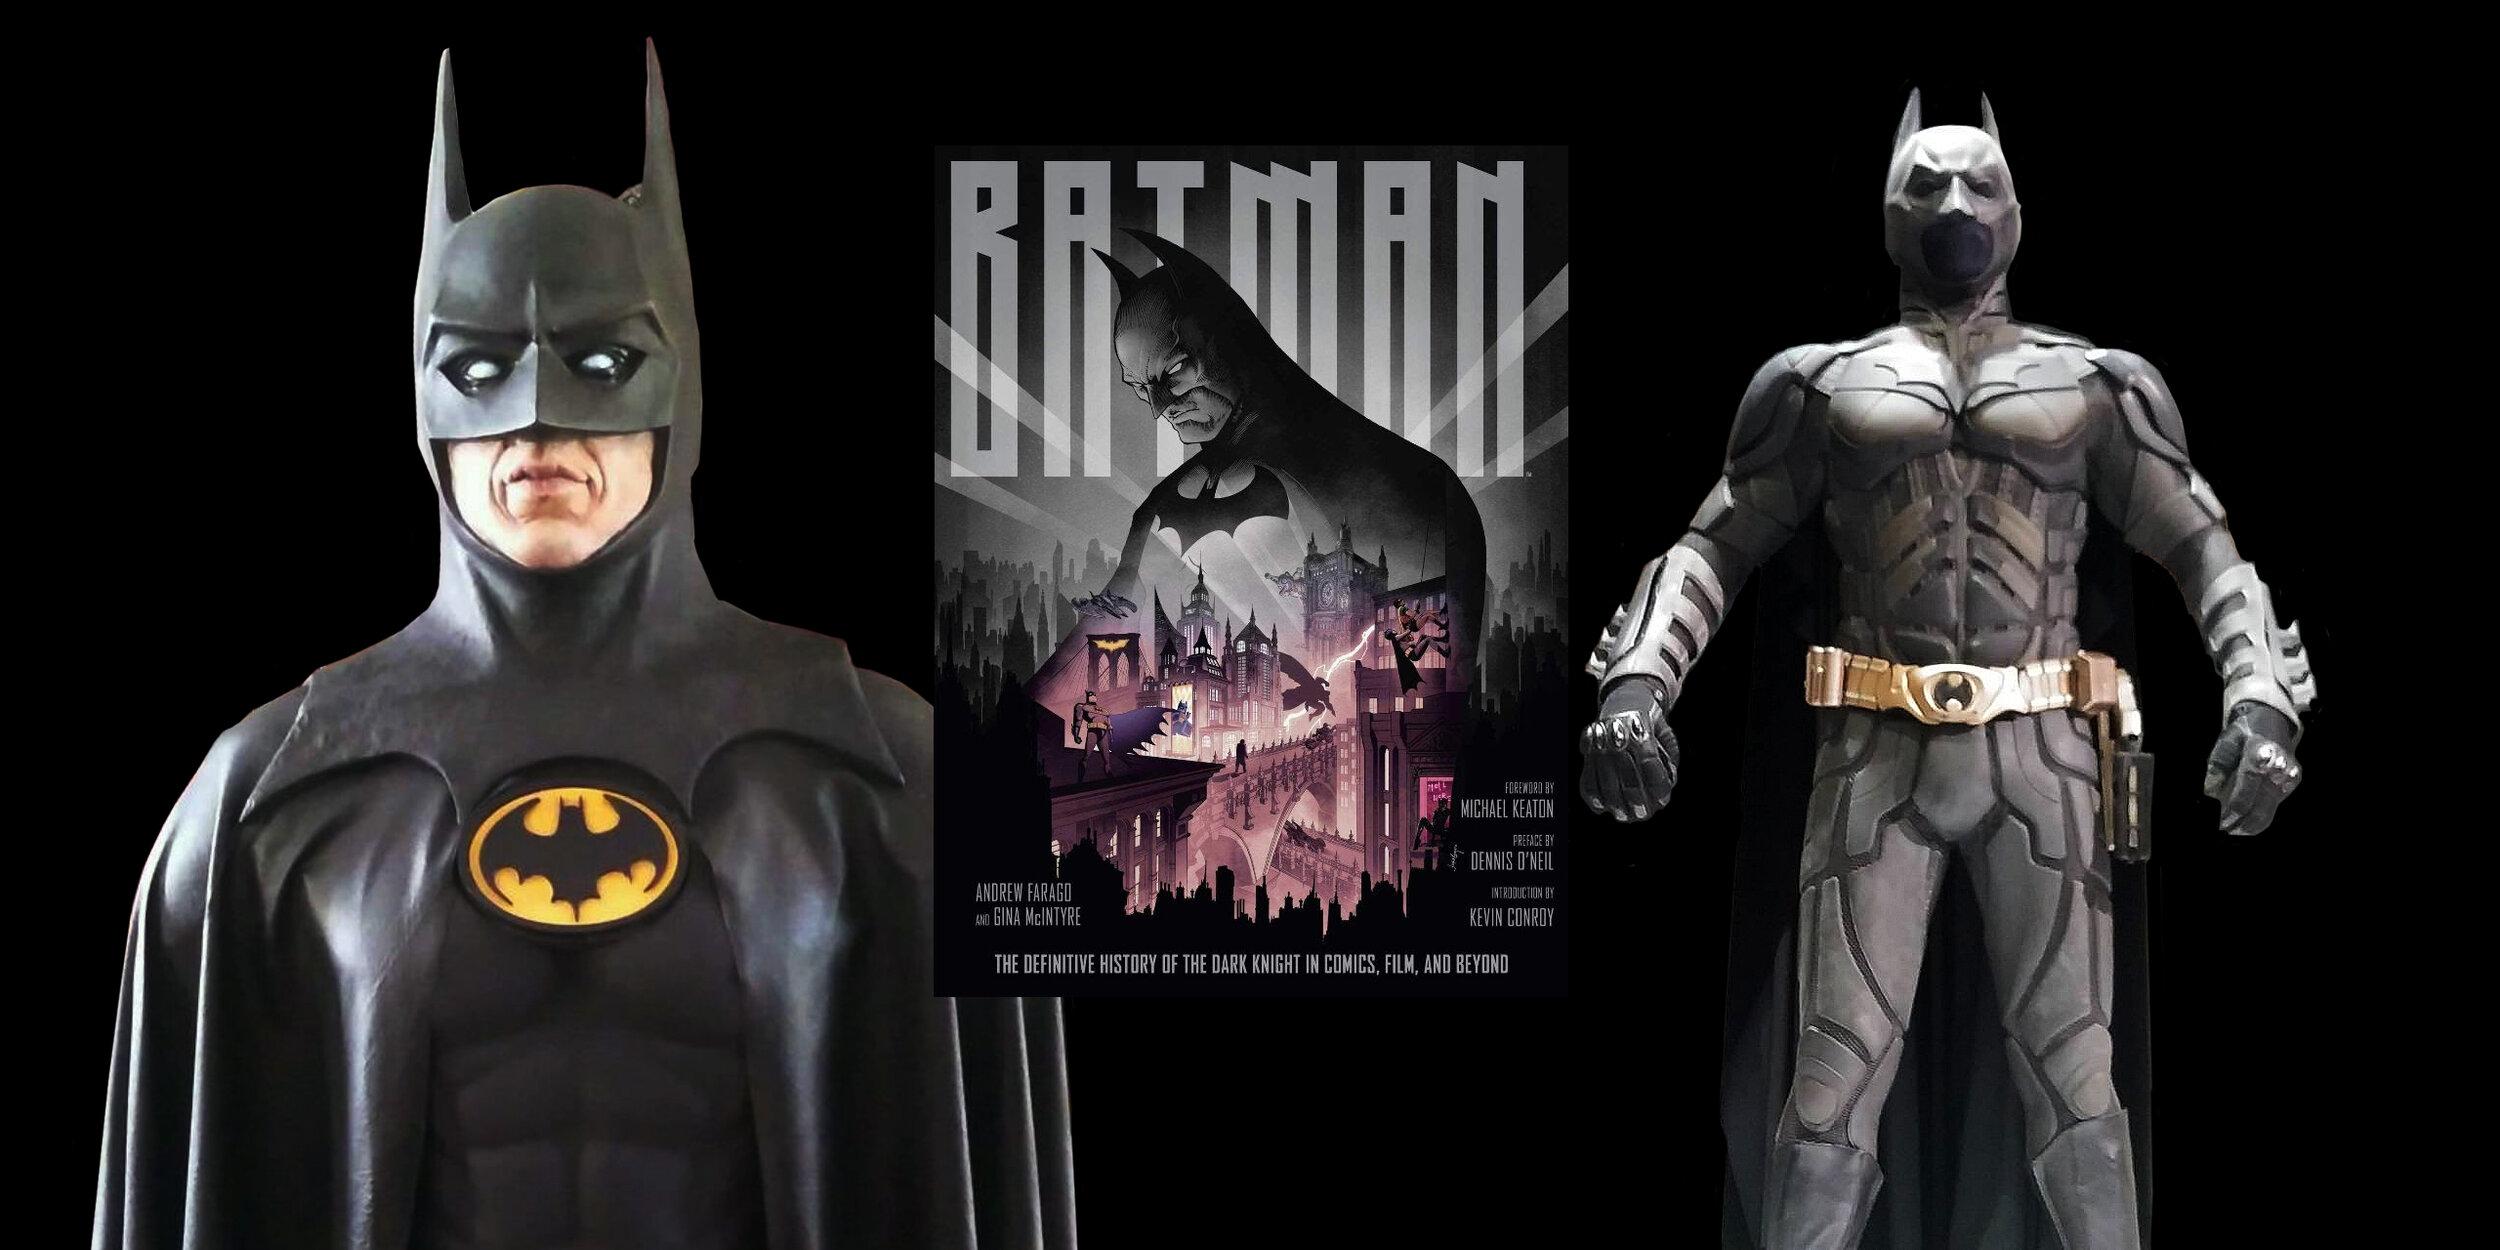 Batman-web-image.jpg